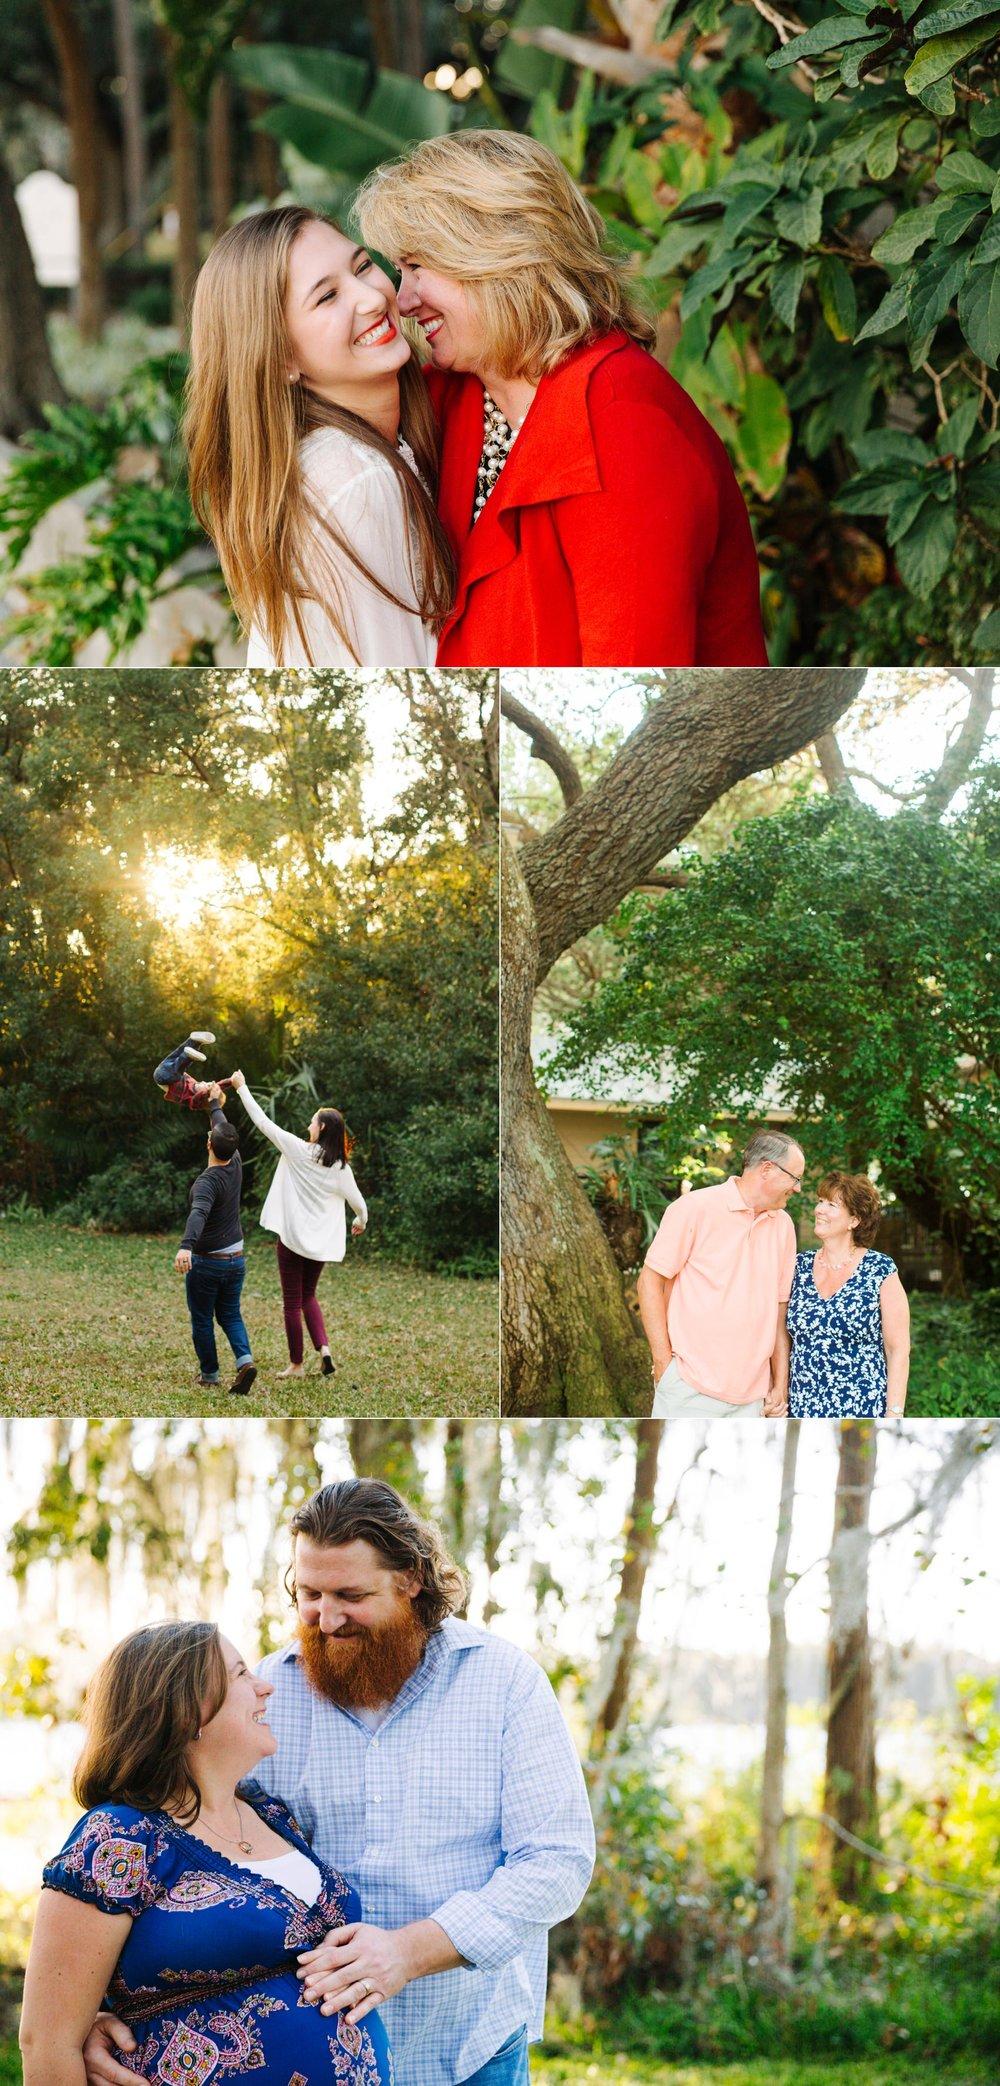 Jake & Katie's Best of Families 2016-004.jpg